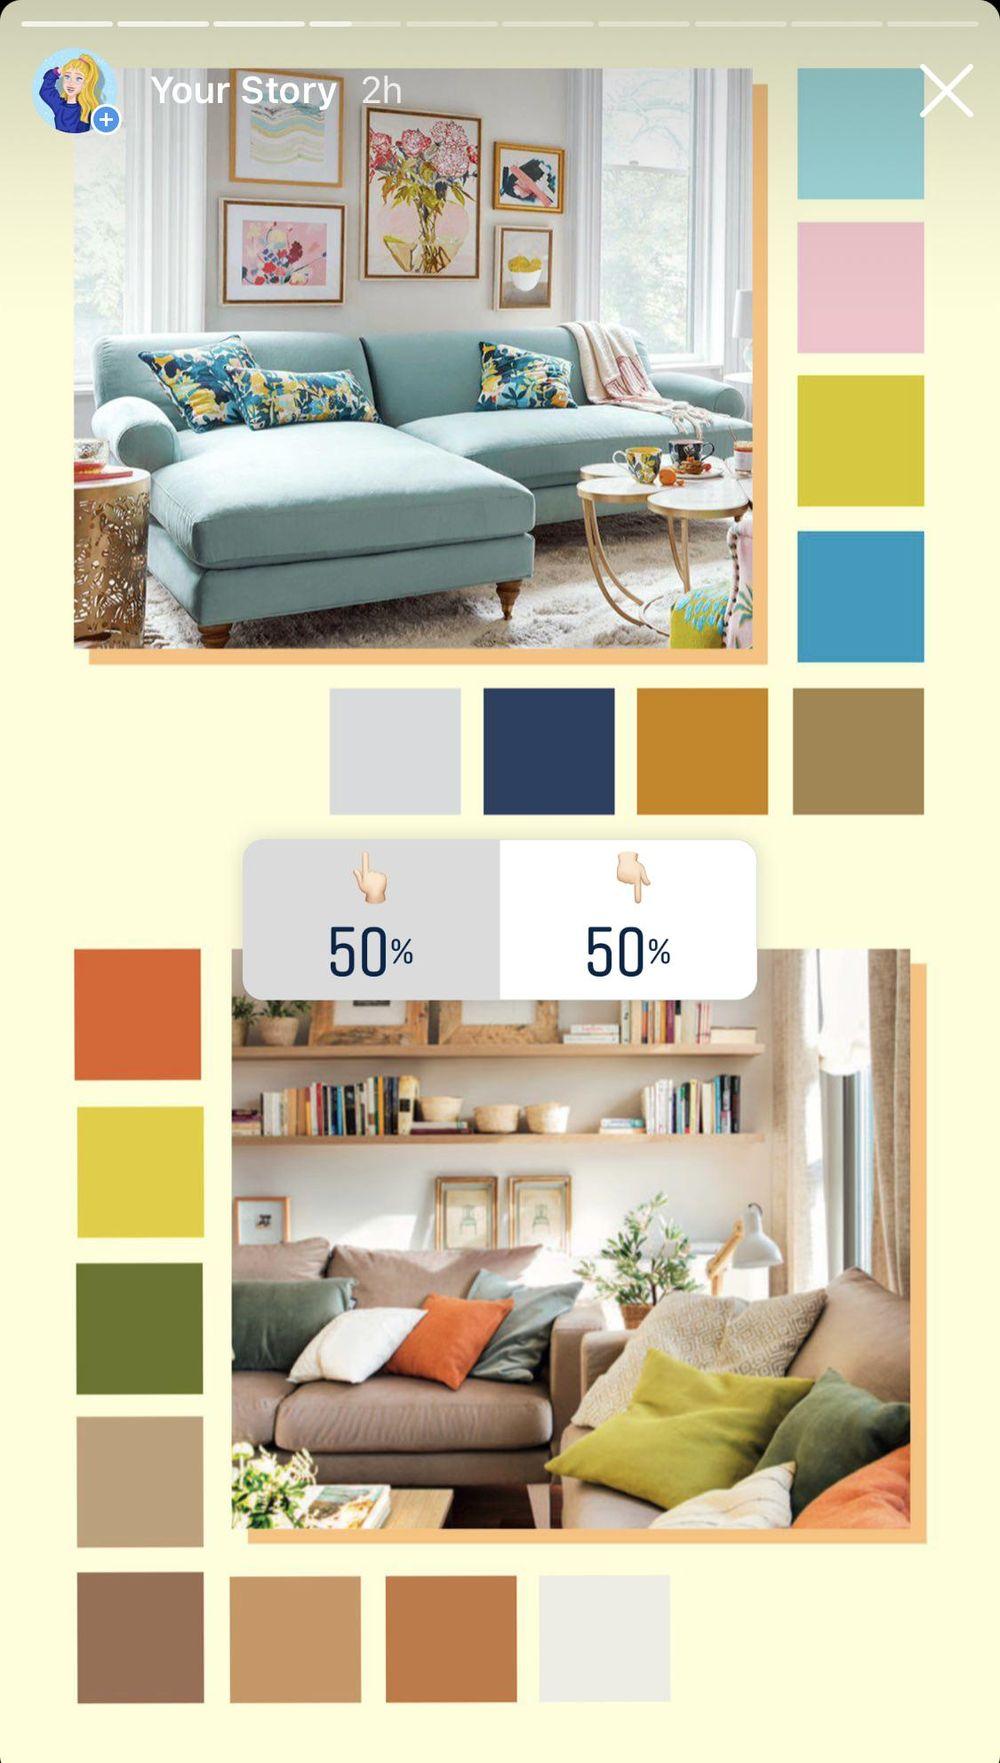 Color Pallettes Inspiration - image 13 - student project